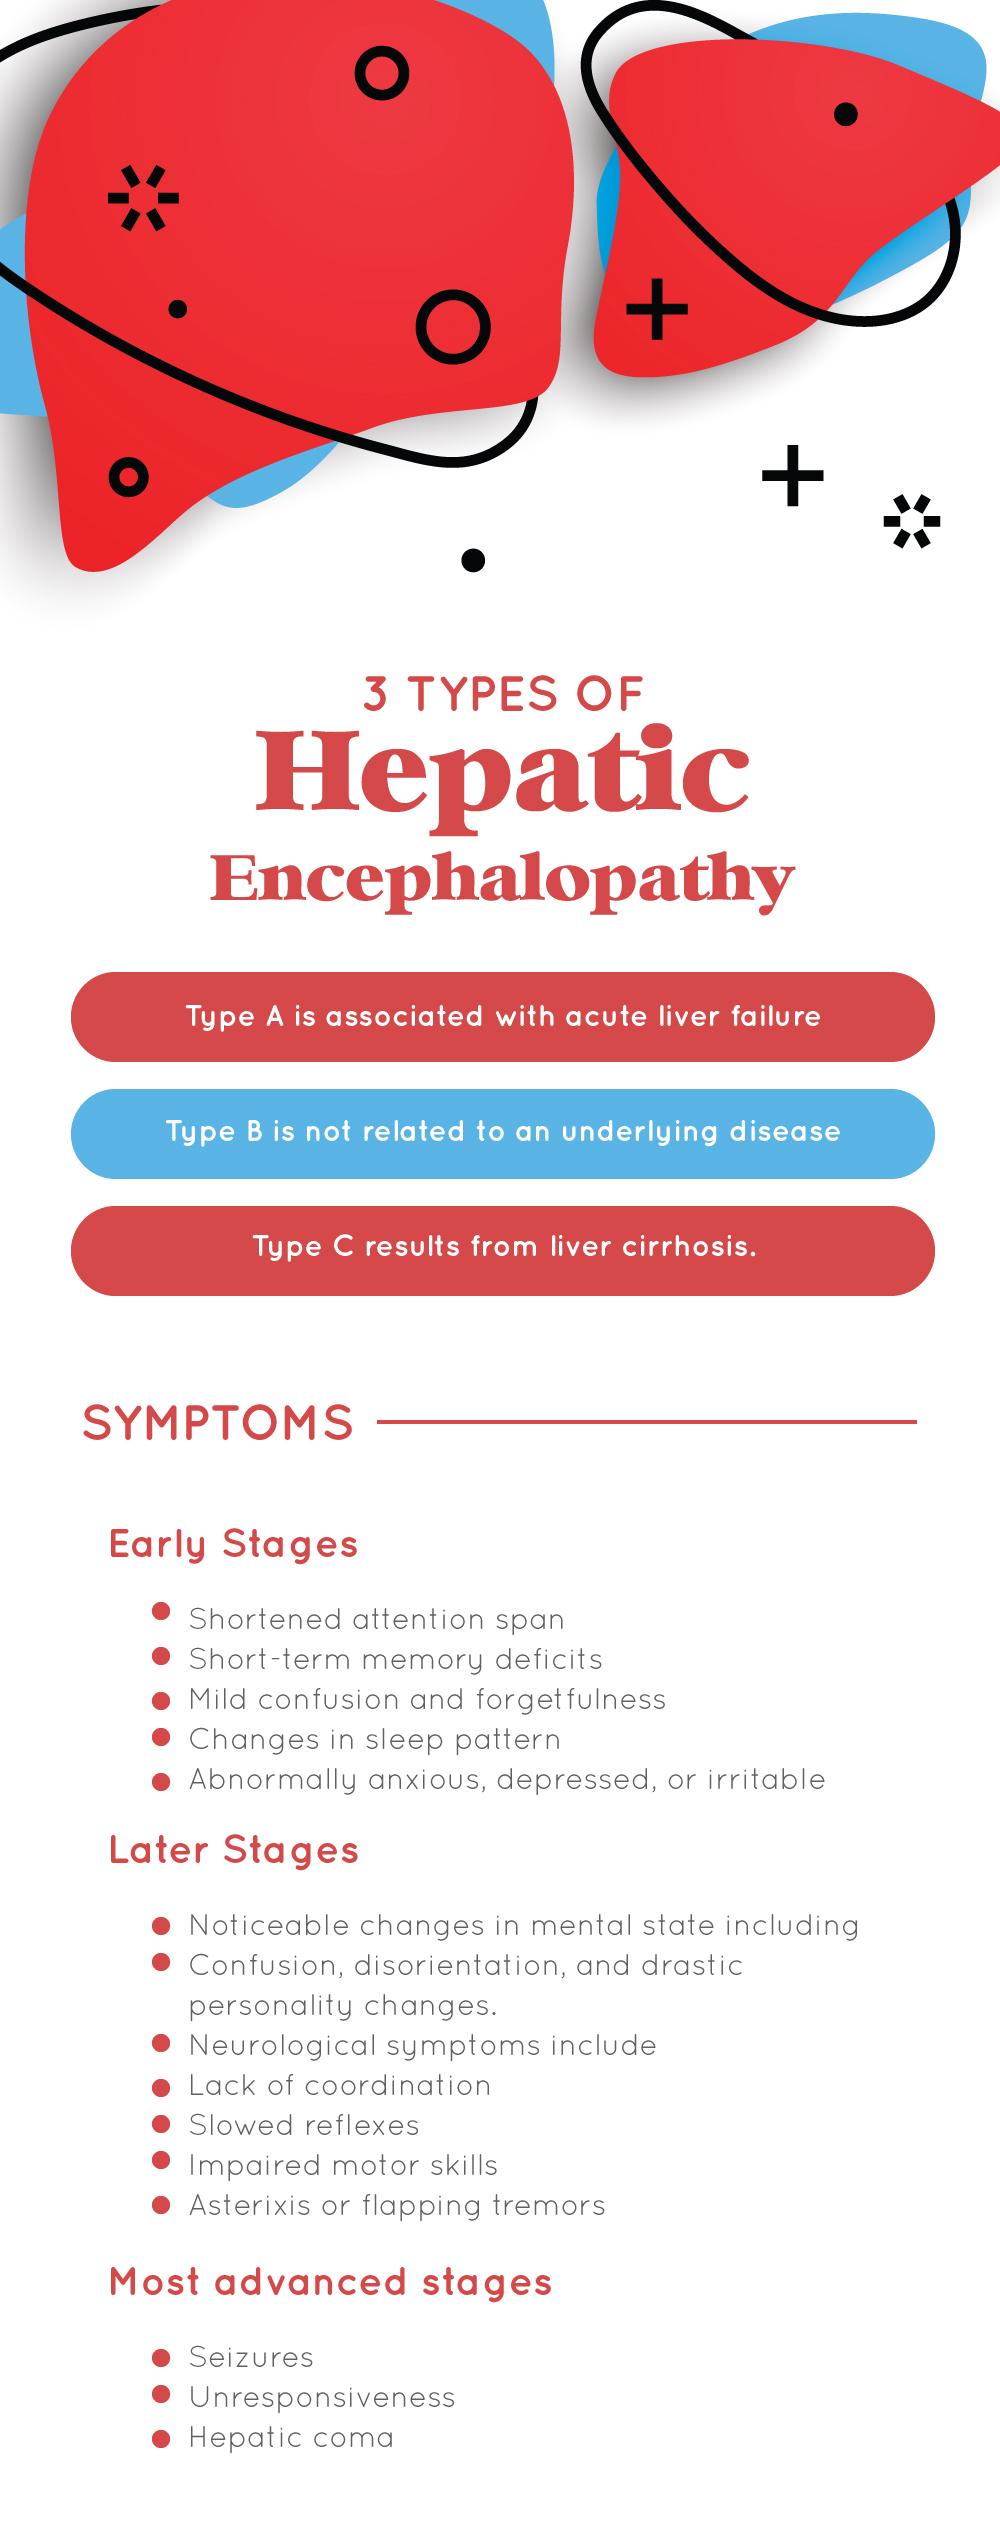 3 Types of Hepatic Encephalopathy